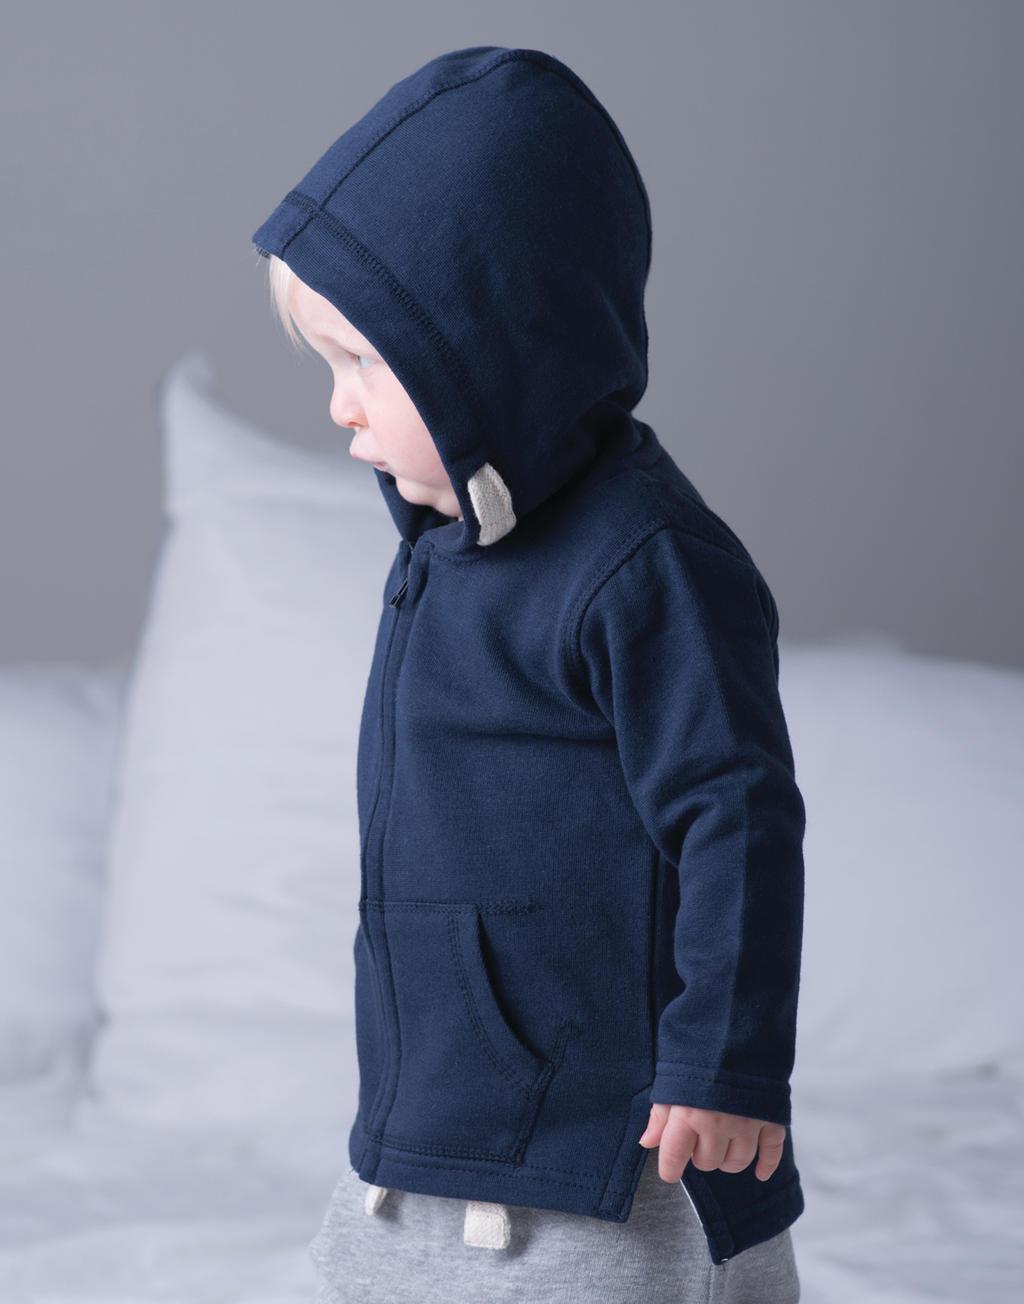 68bd071a31b4e Sweat shirt bébé personnalisable   Sweat shirt Capuche